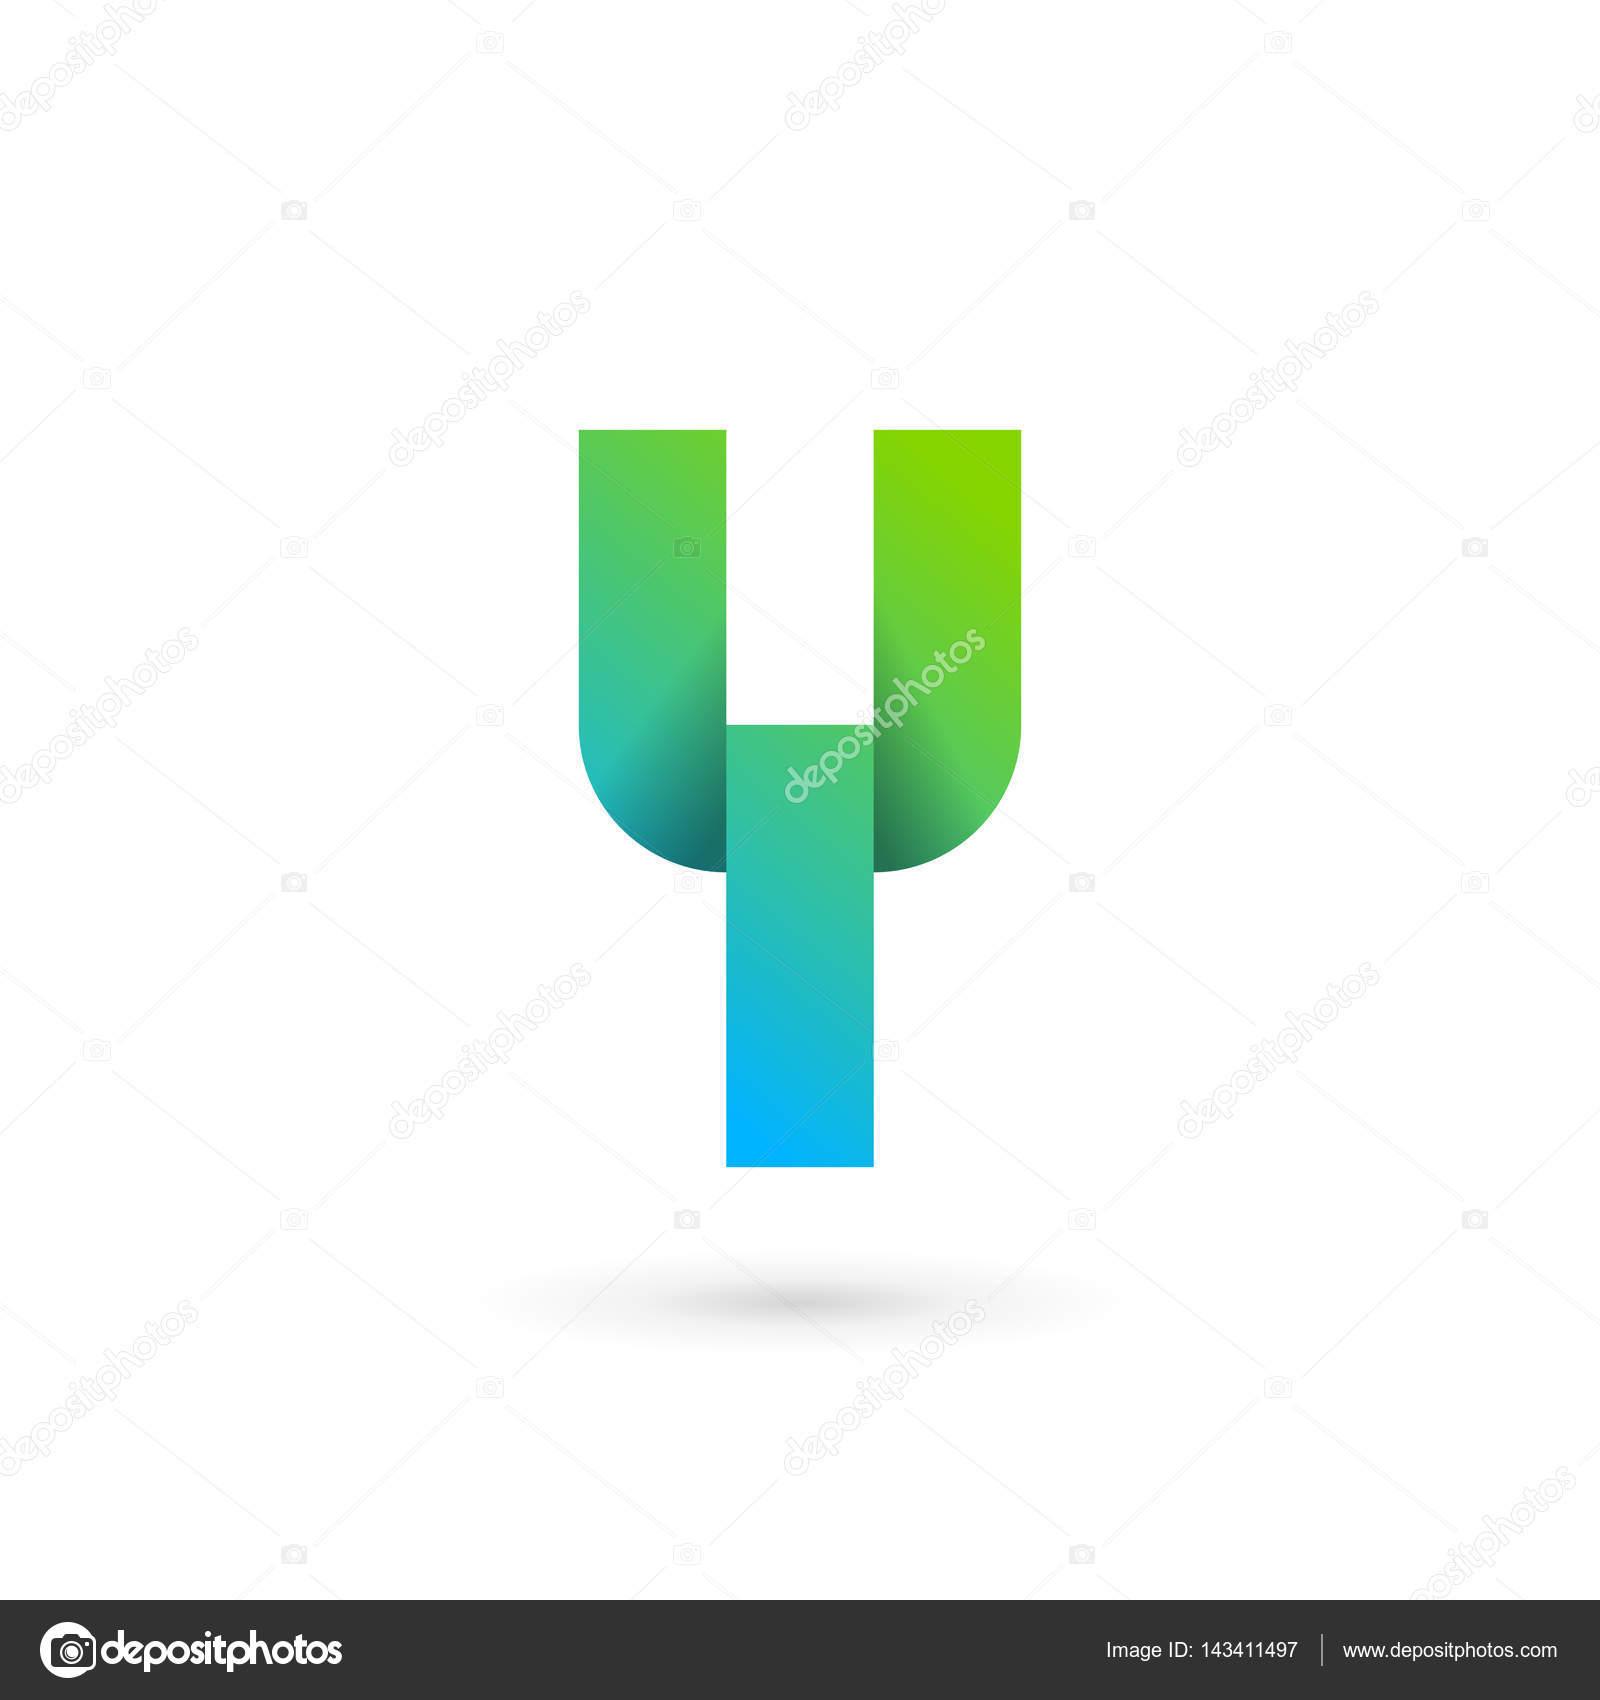 Letter y ribbon logo icon design template elements stock vector letter y ribbon logo icon design template elements stock vector maxwellsz